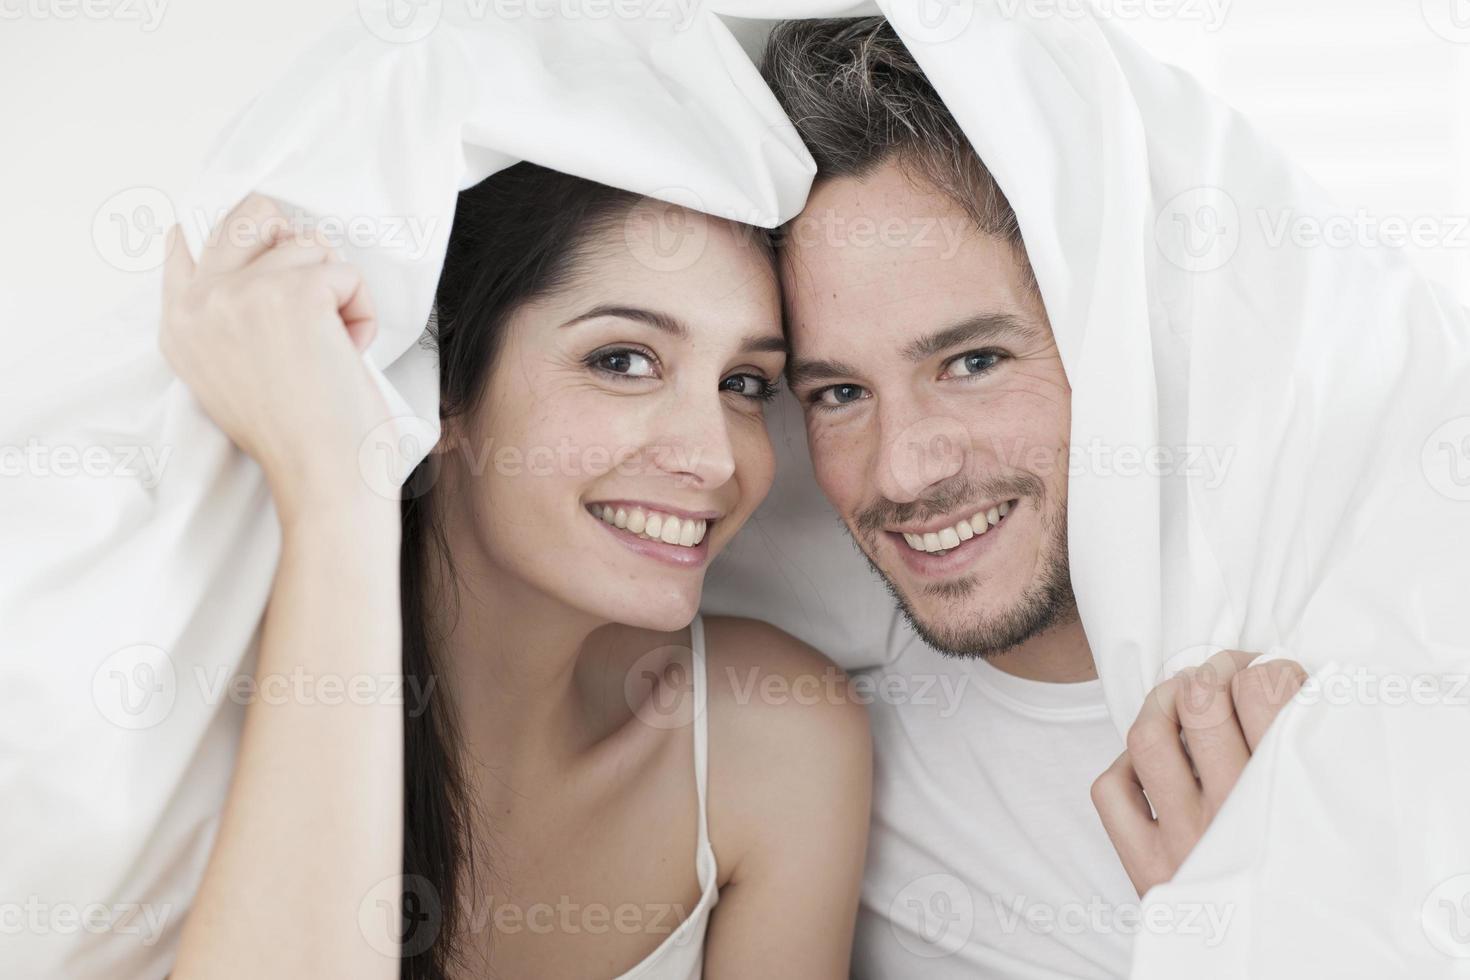 glada unga par lindade i sin täcke foto